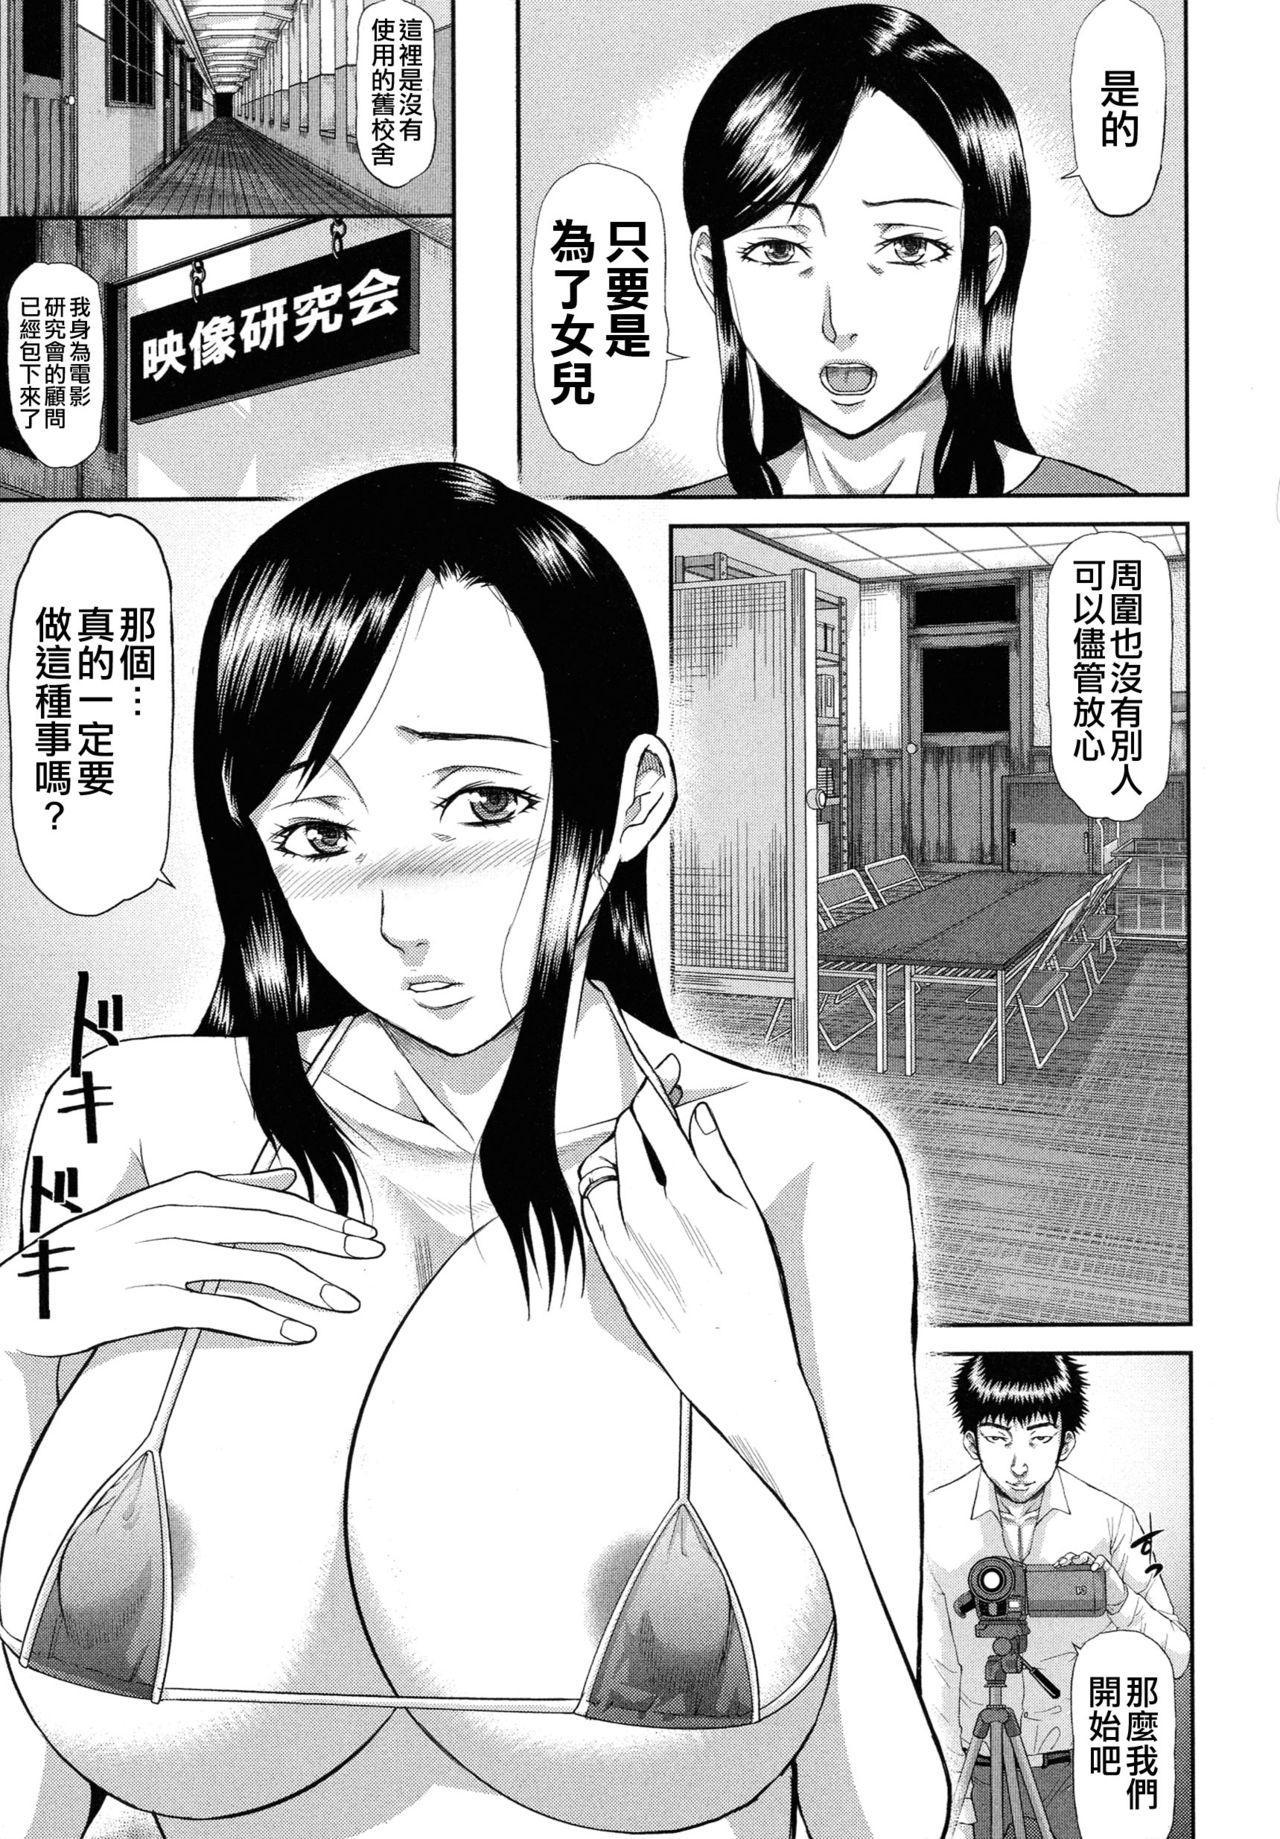 [Honebuto Danshaku] Innou Kaizou Program ~Oyako Zecchou Cult Ochi~ [Chinese]【不想记名重嵌--高质量图源】 139